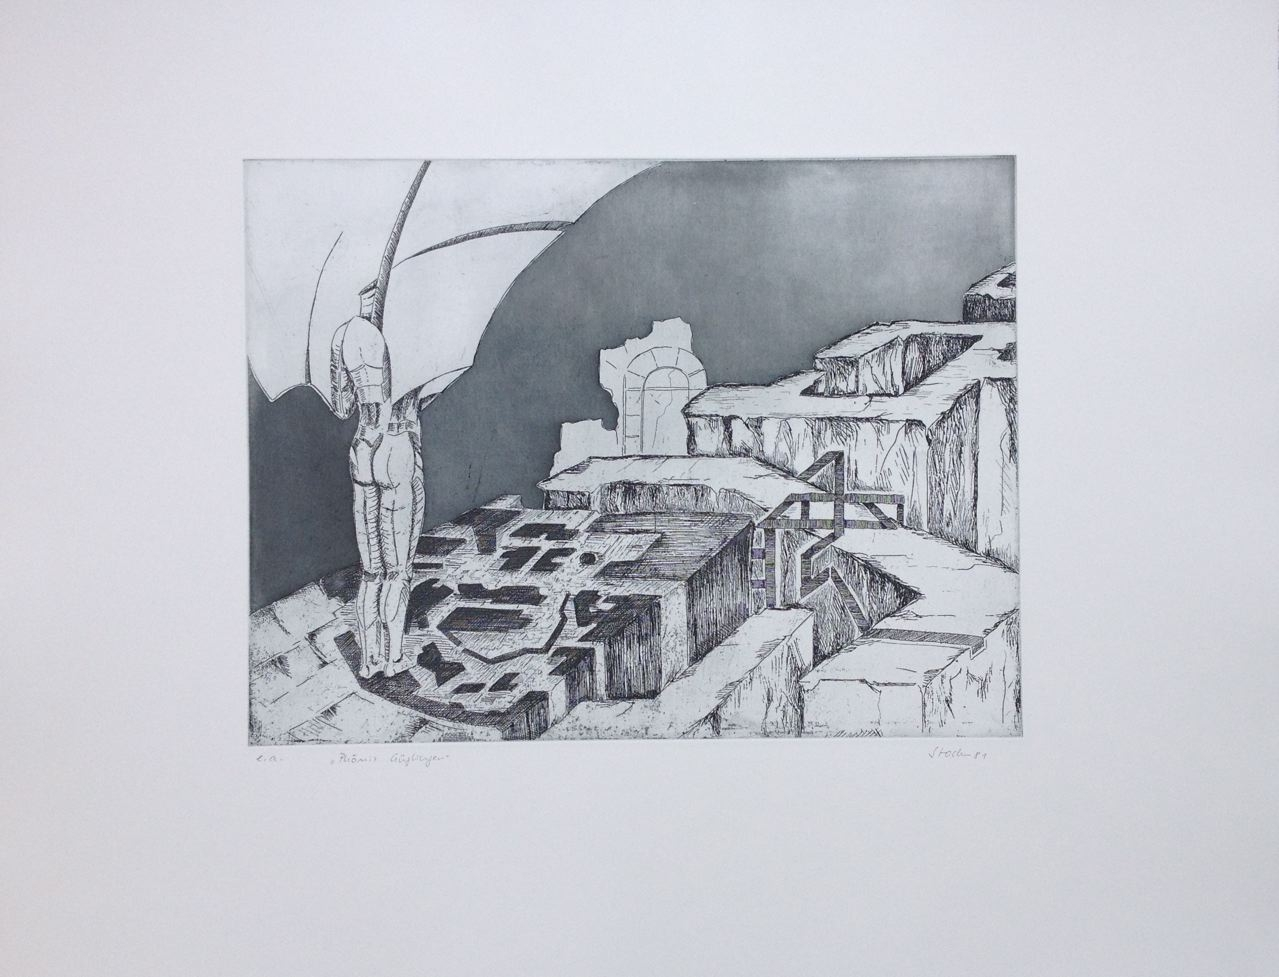 """Phönix Güglingen"", 1981, Radierung, Aquatinta, 60 x 50 cm (#919)"